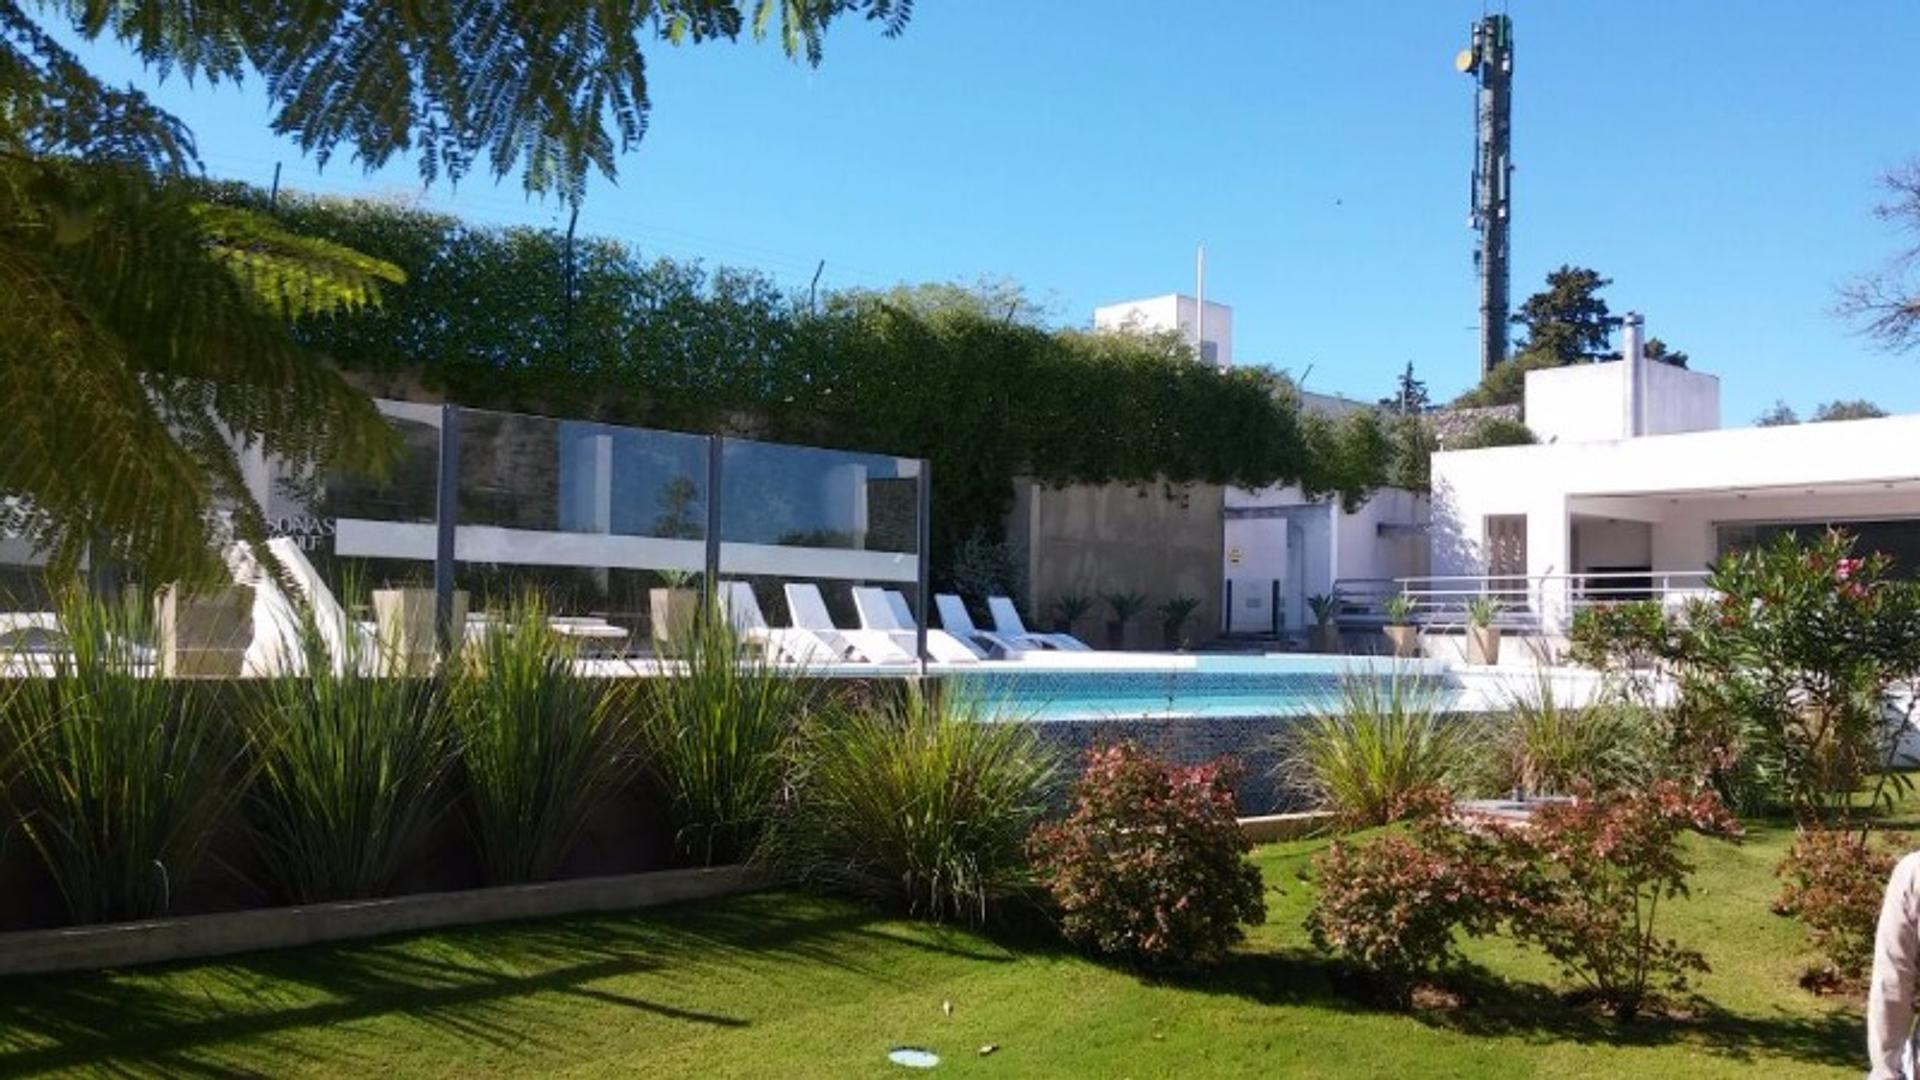 Villa Allende Golf, Rio De Janeiro 4200 1° - U$D 260.000 - Departamento en Venta